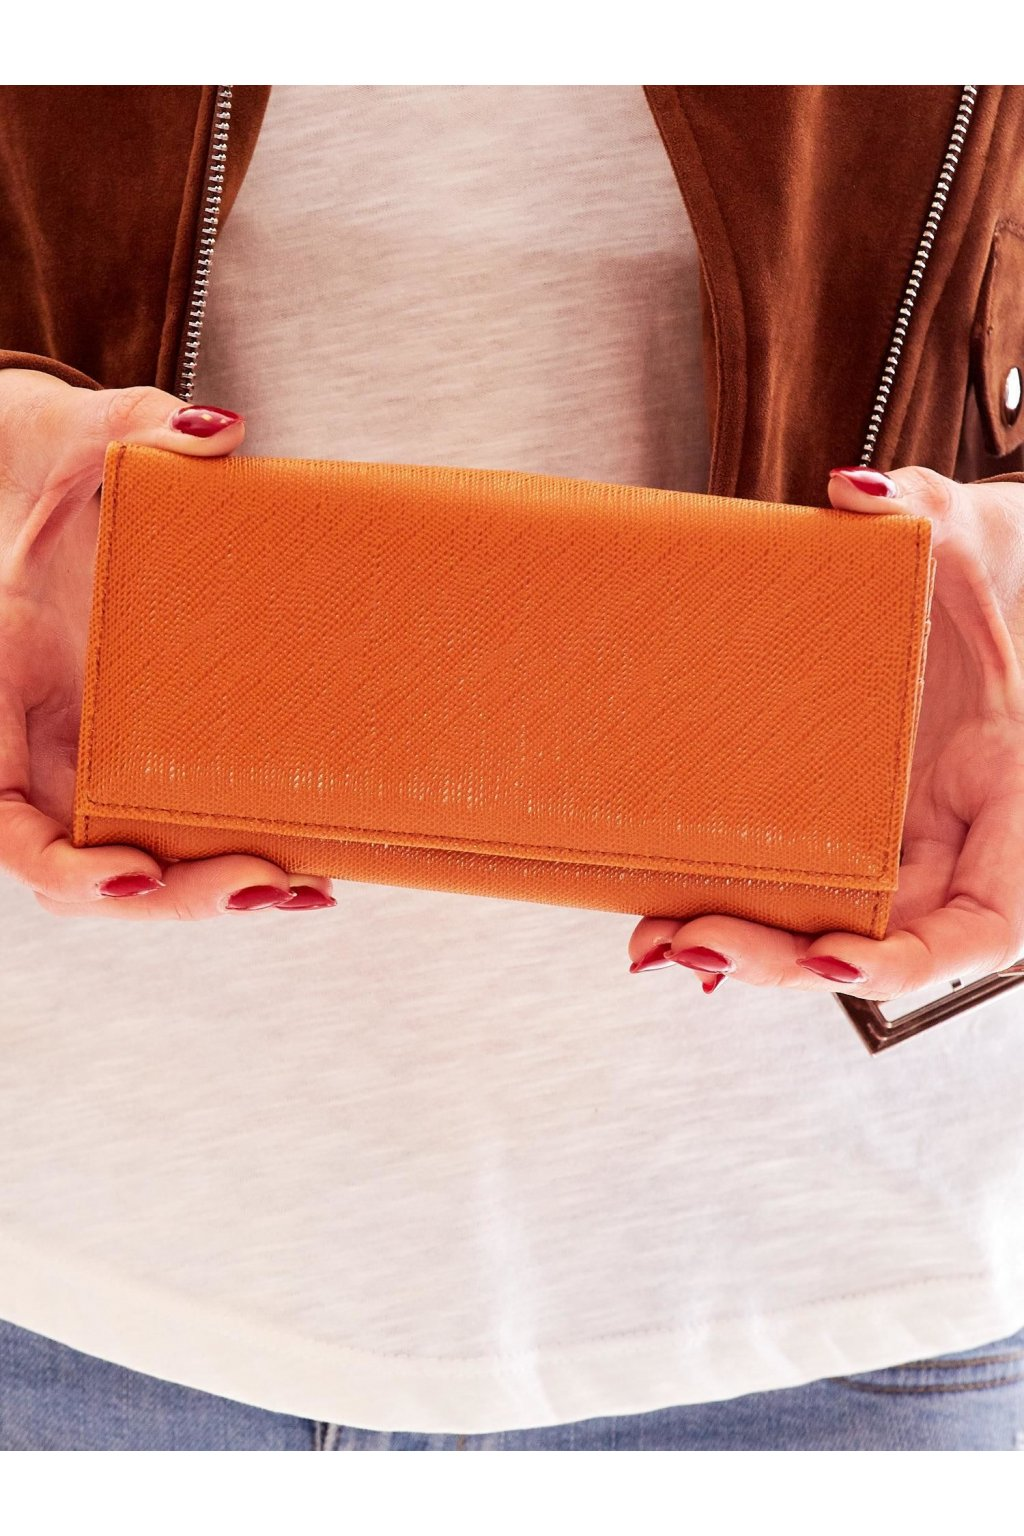 Peňaženka kód G114-12016